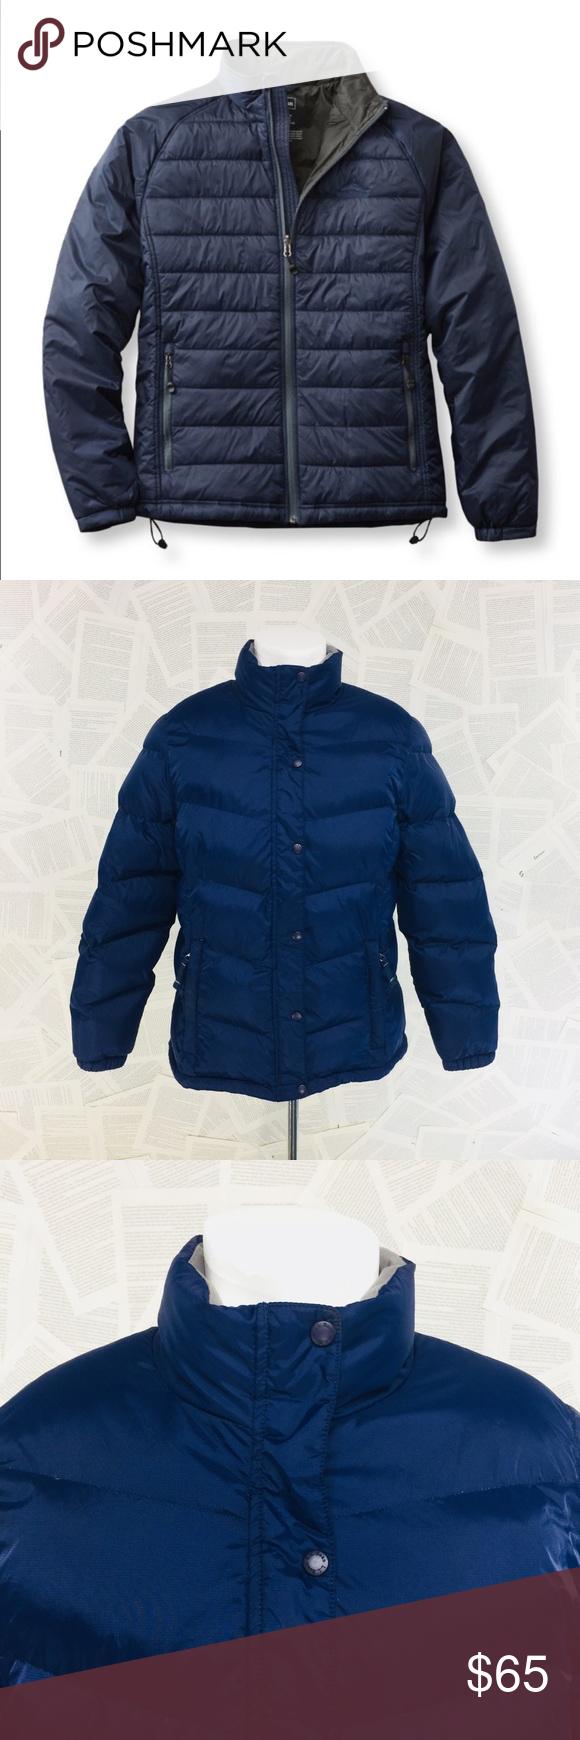 L L Bean Navy Blue Gray Puffer Jacket Coat Xl Reg Jackets Coats Jackets Clothes Design [ 1740 x 580 Pixel ]